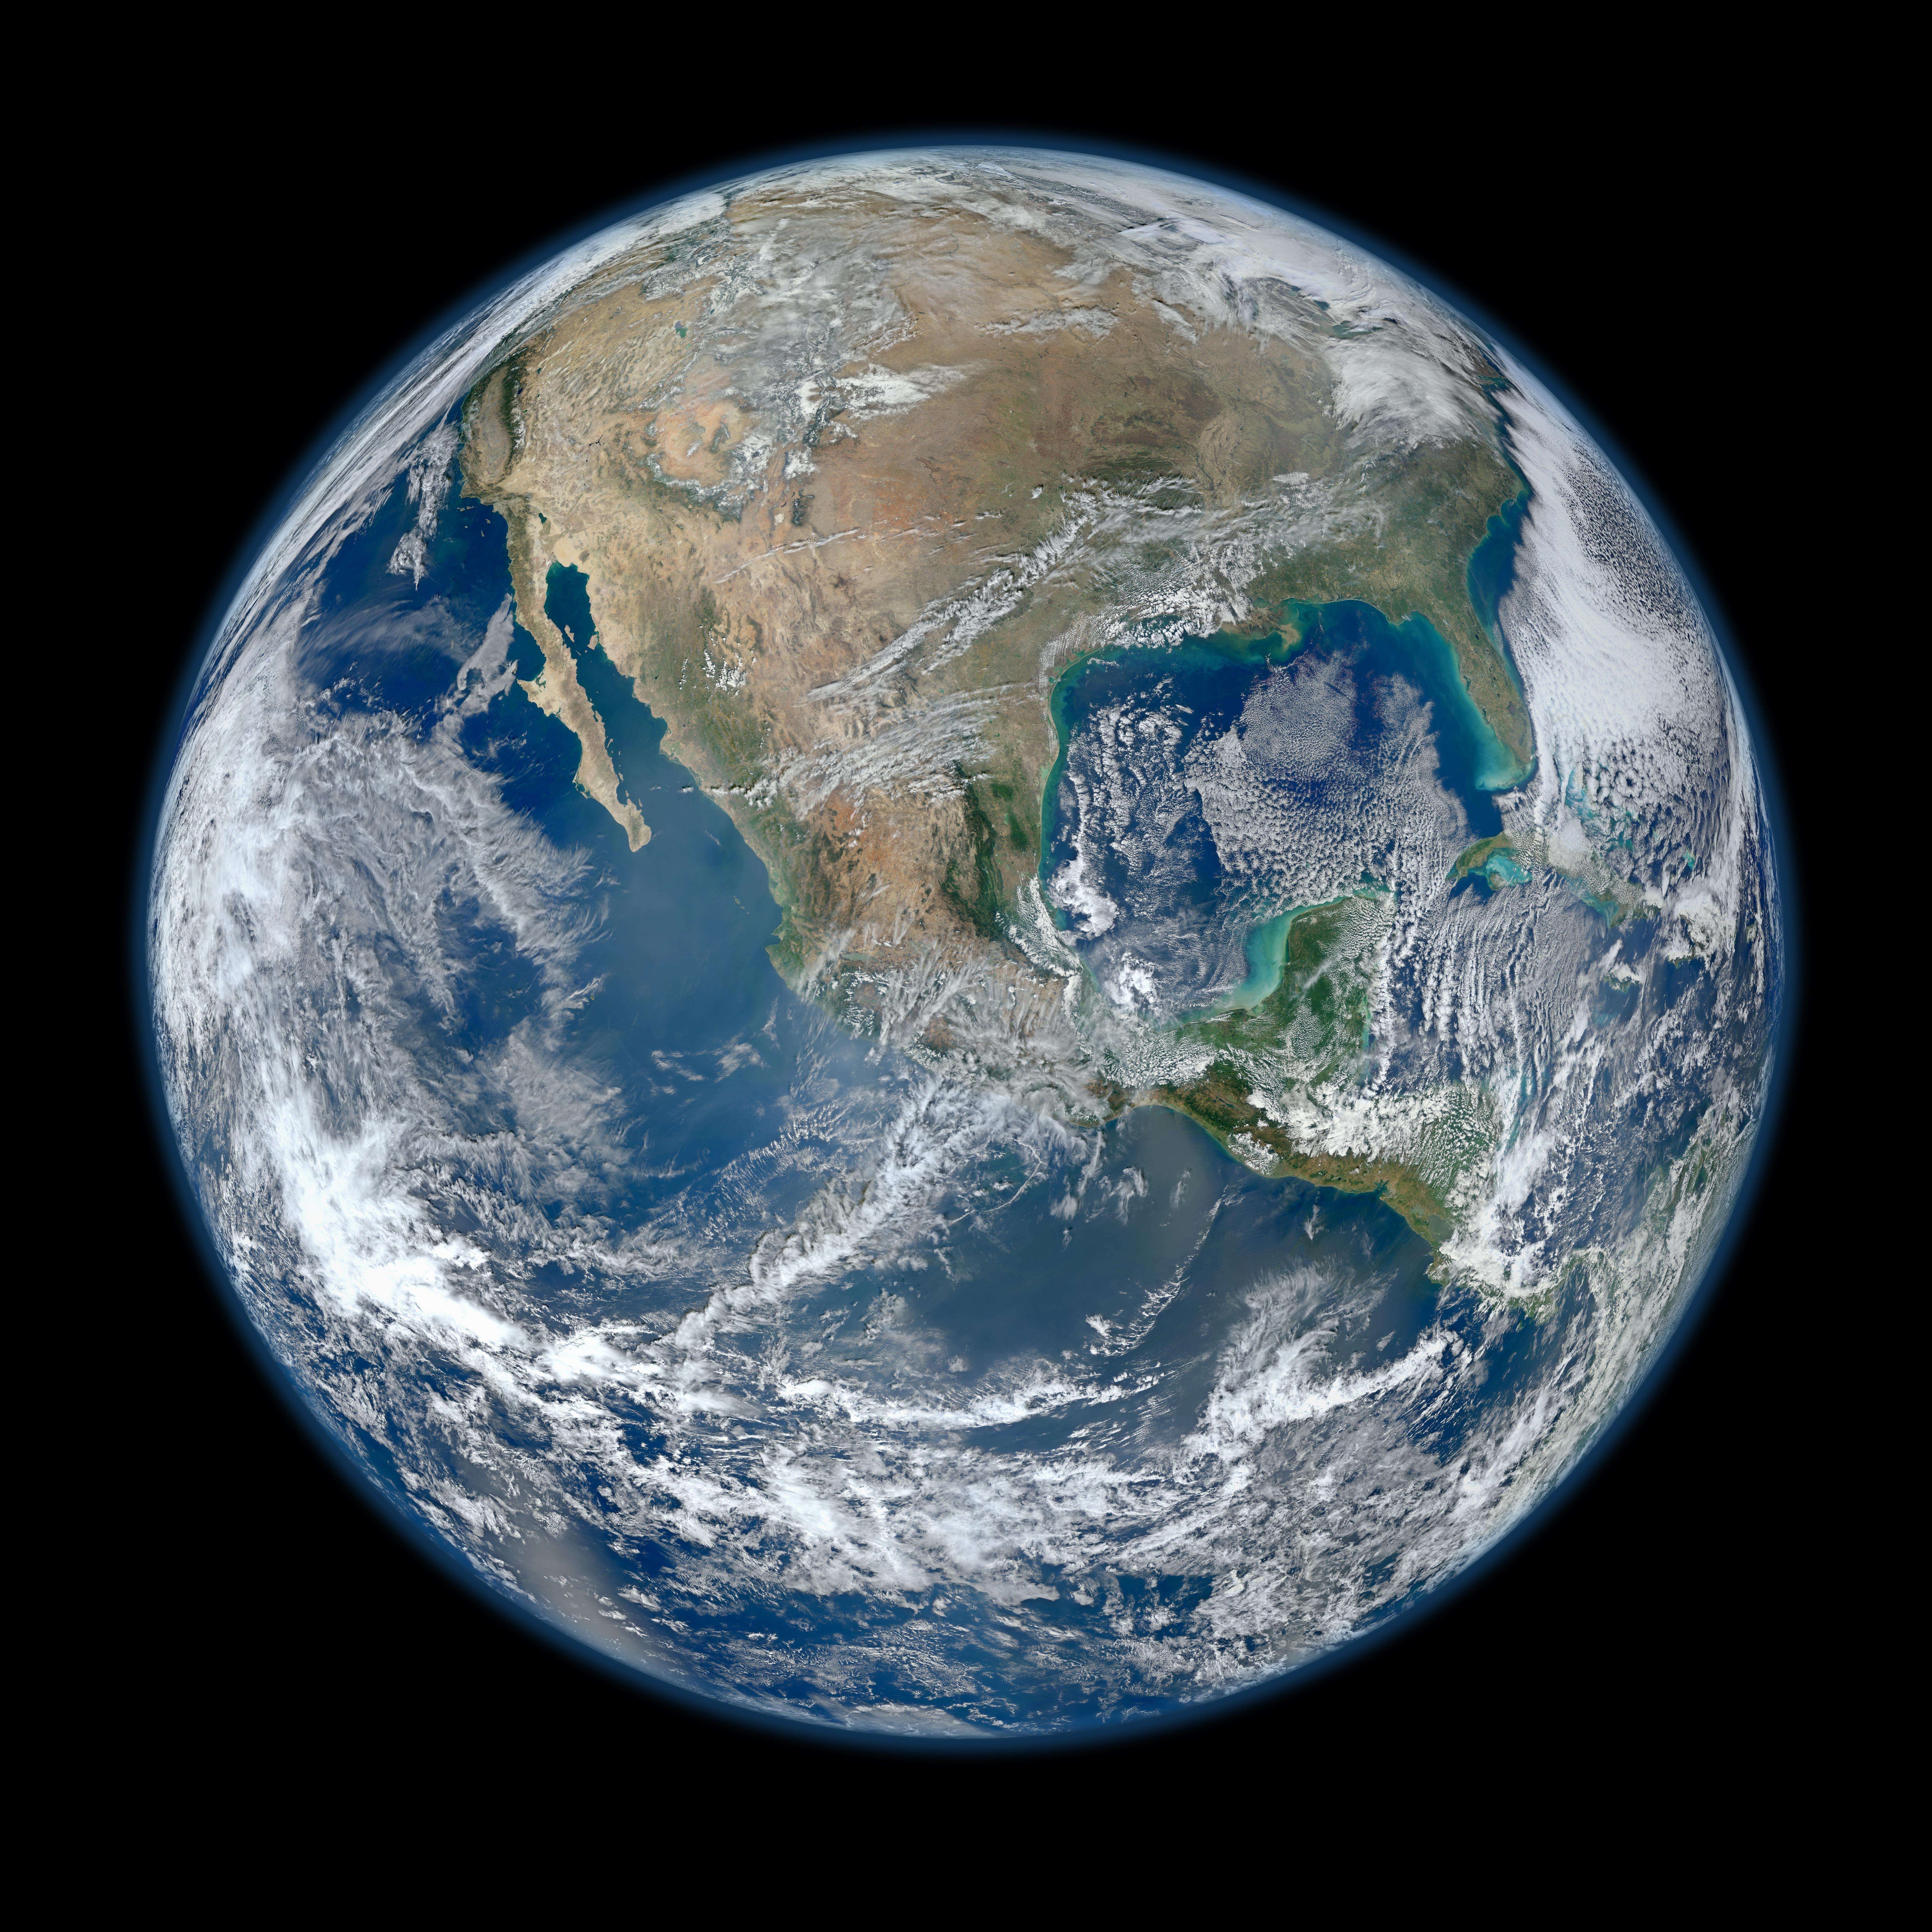 Earth via NASA/JPL's Suomi NPP satellite [8000 x 8000